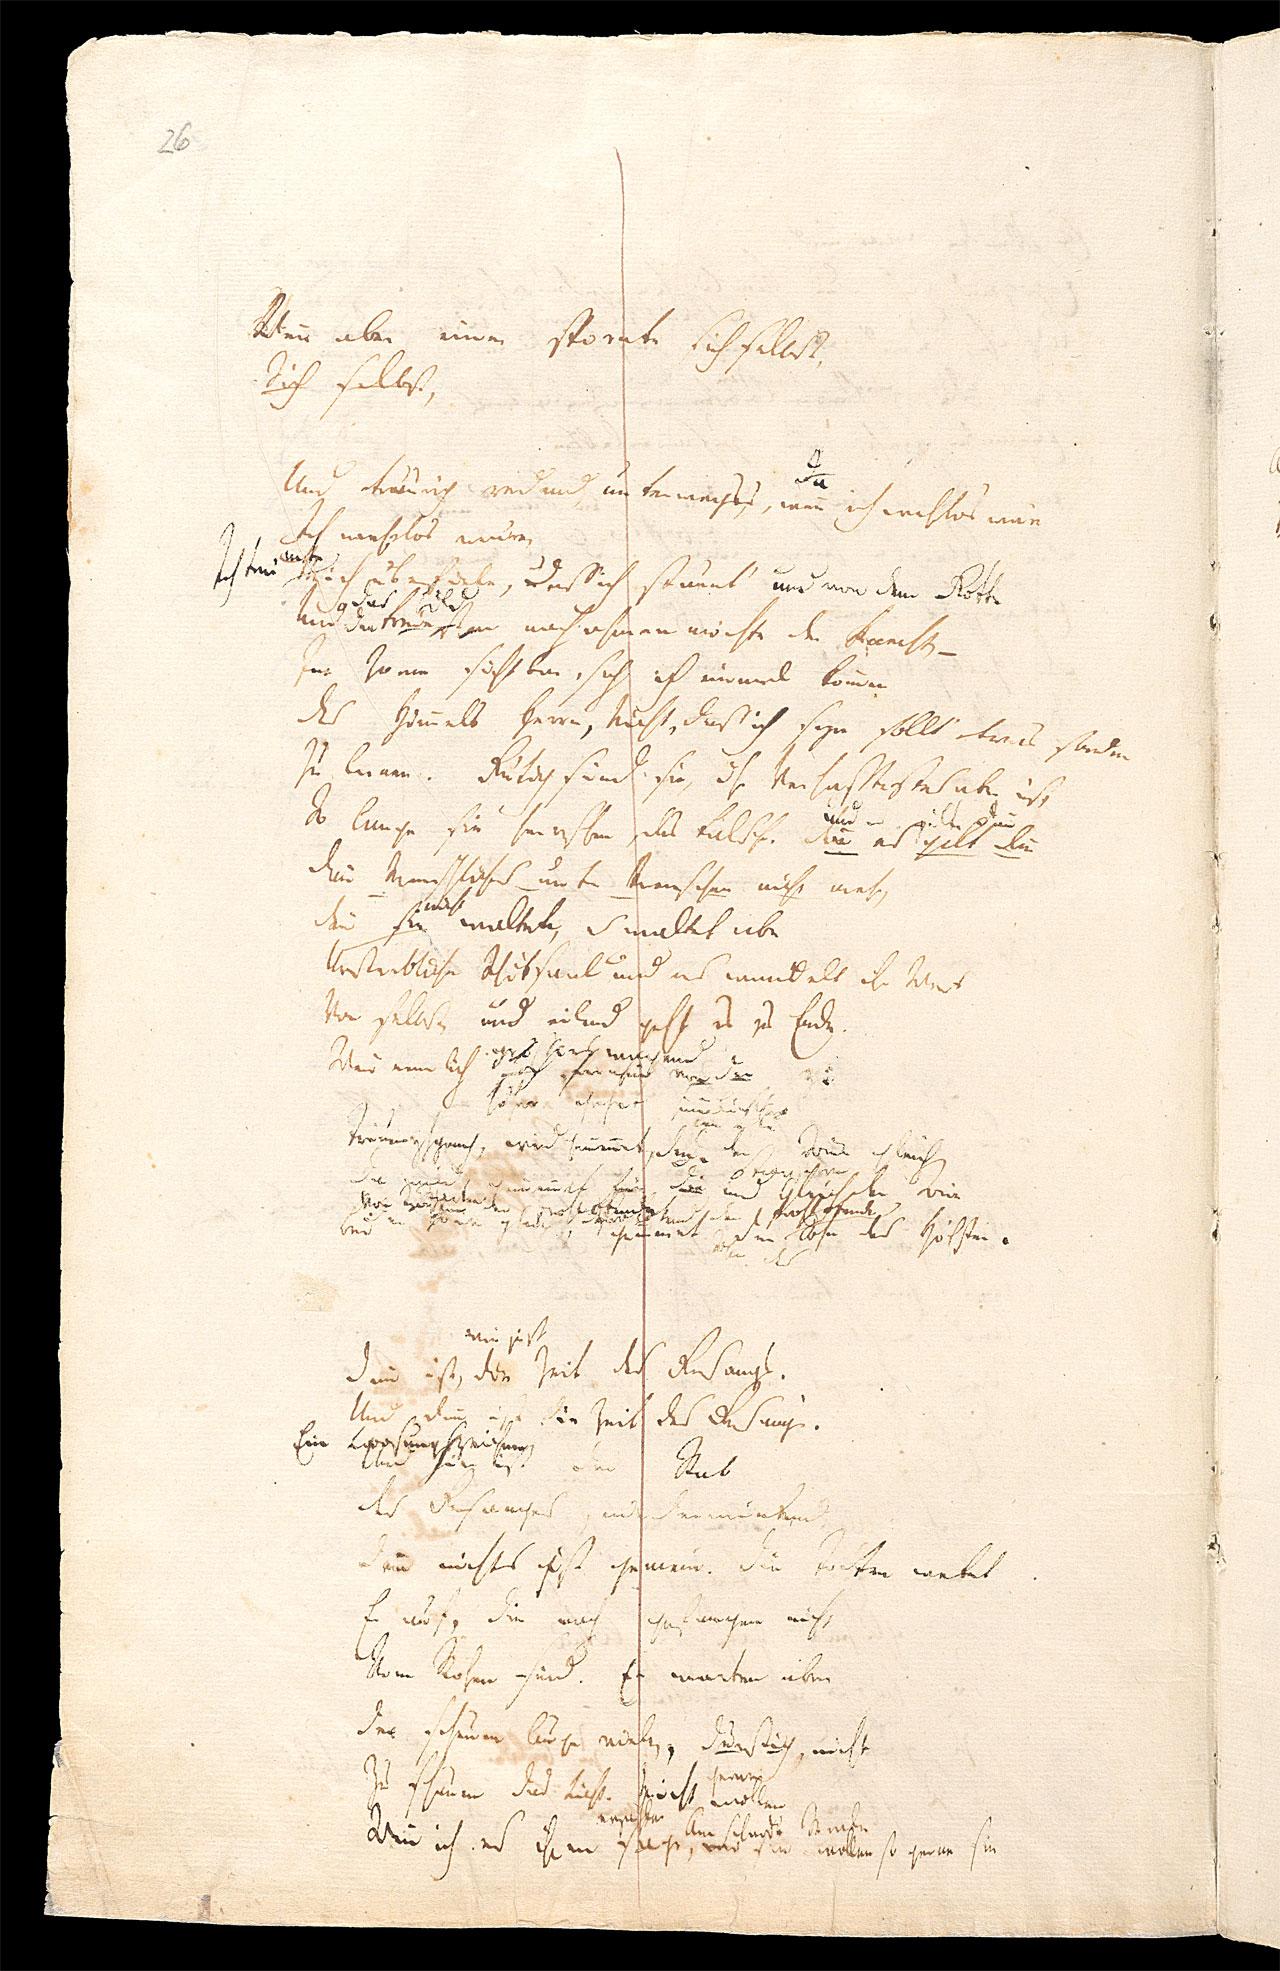 Friedrich Hölderlin, Homburger Folioheft, Seite 26, Patmos, Handschrift